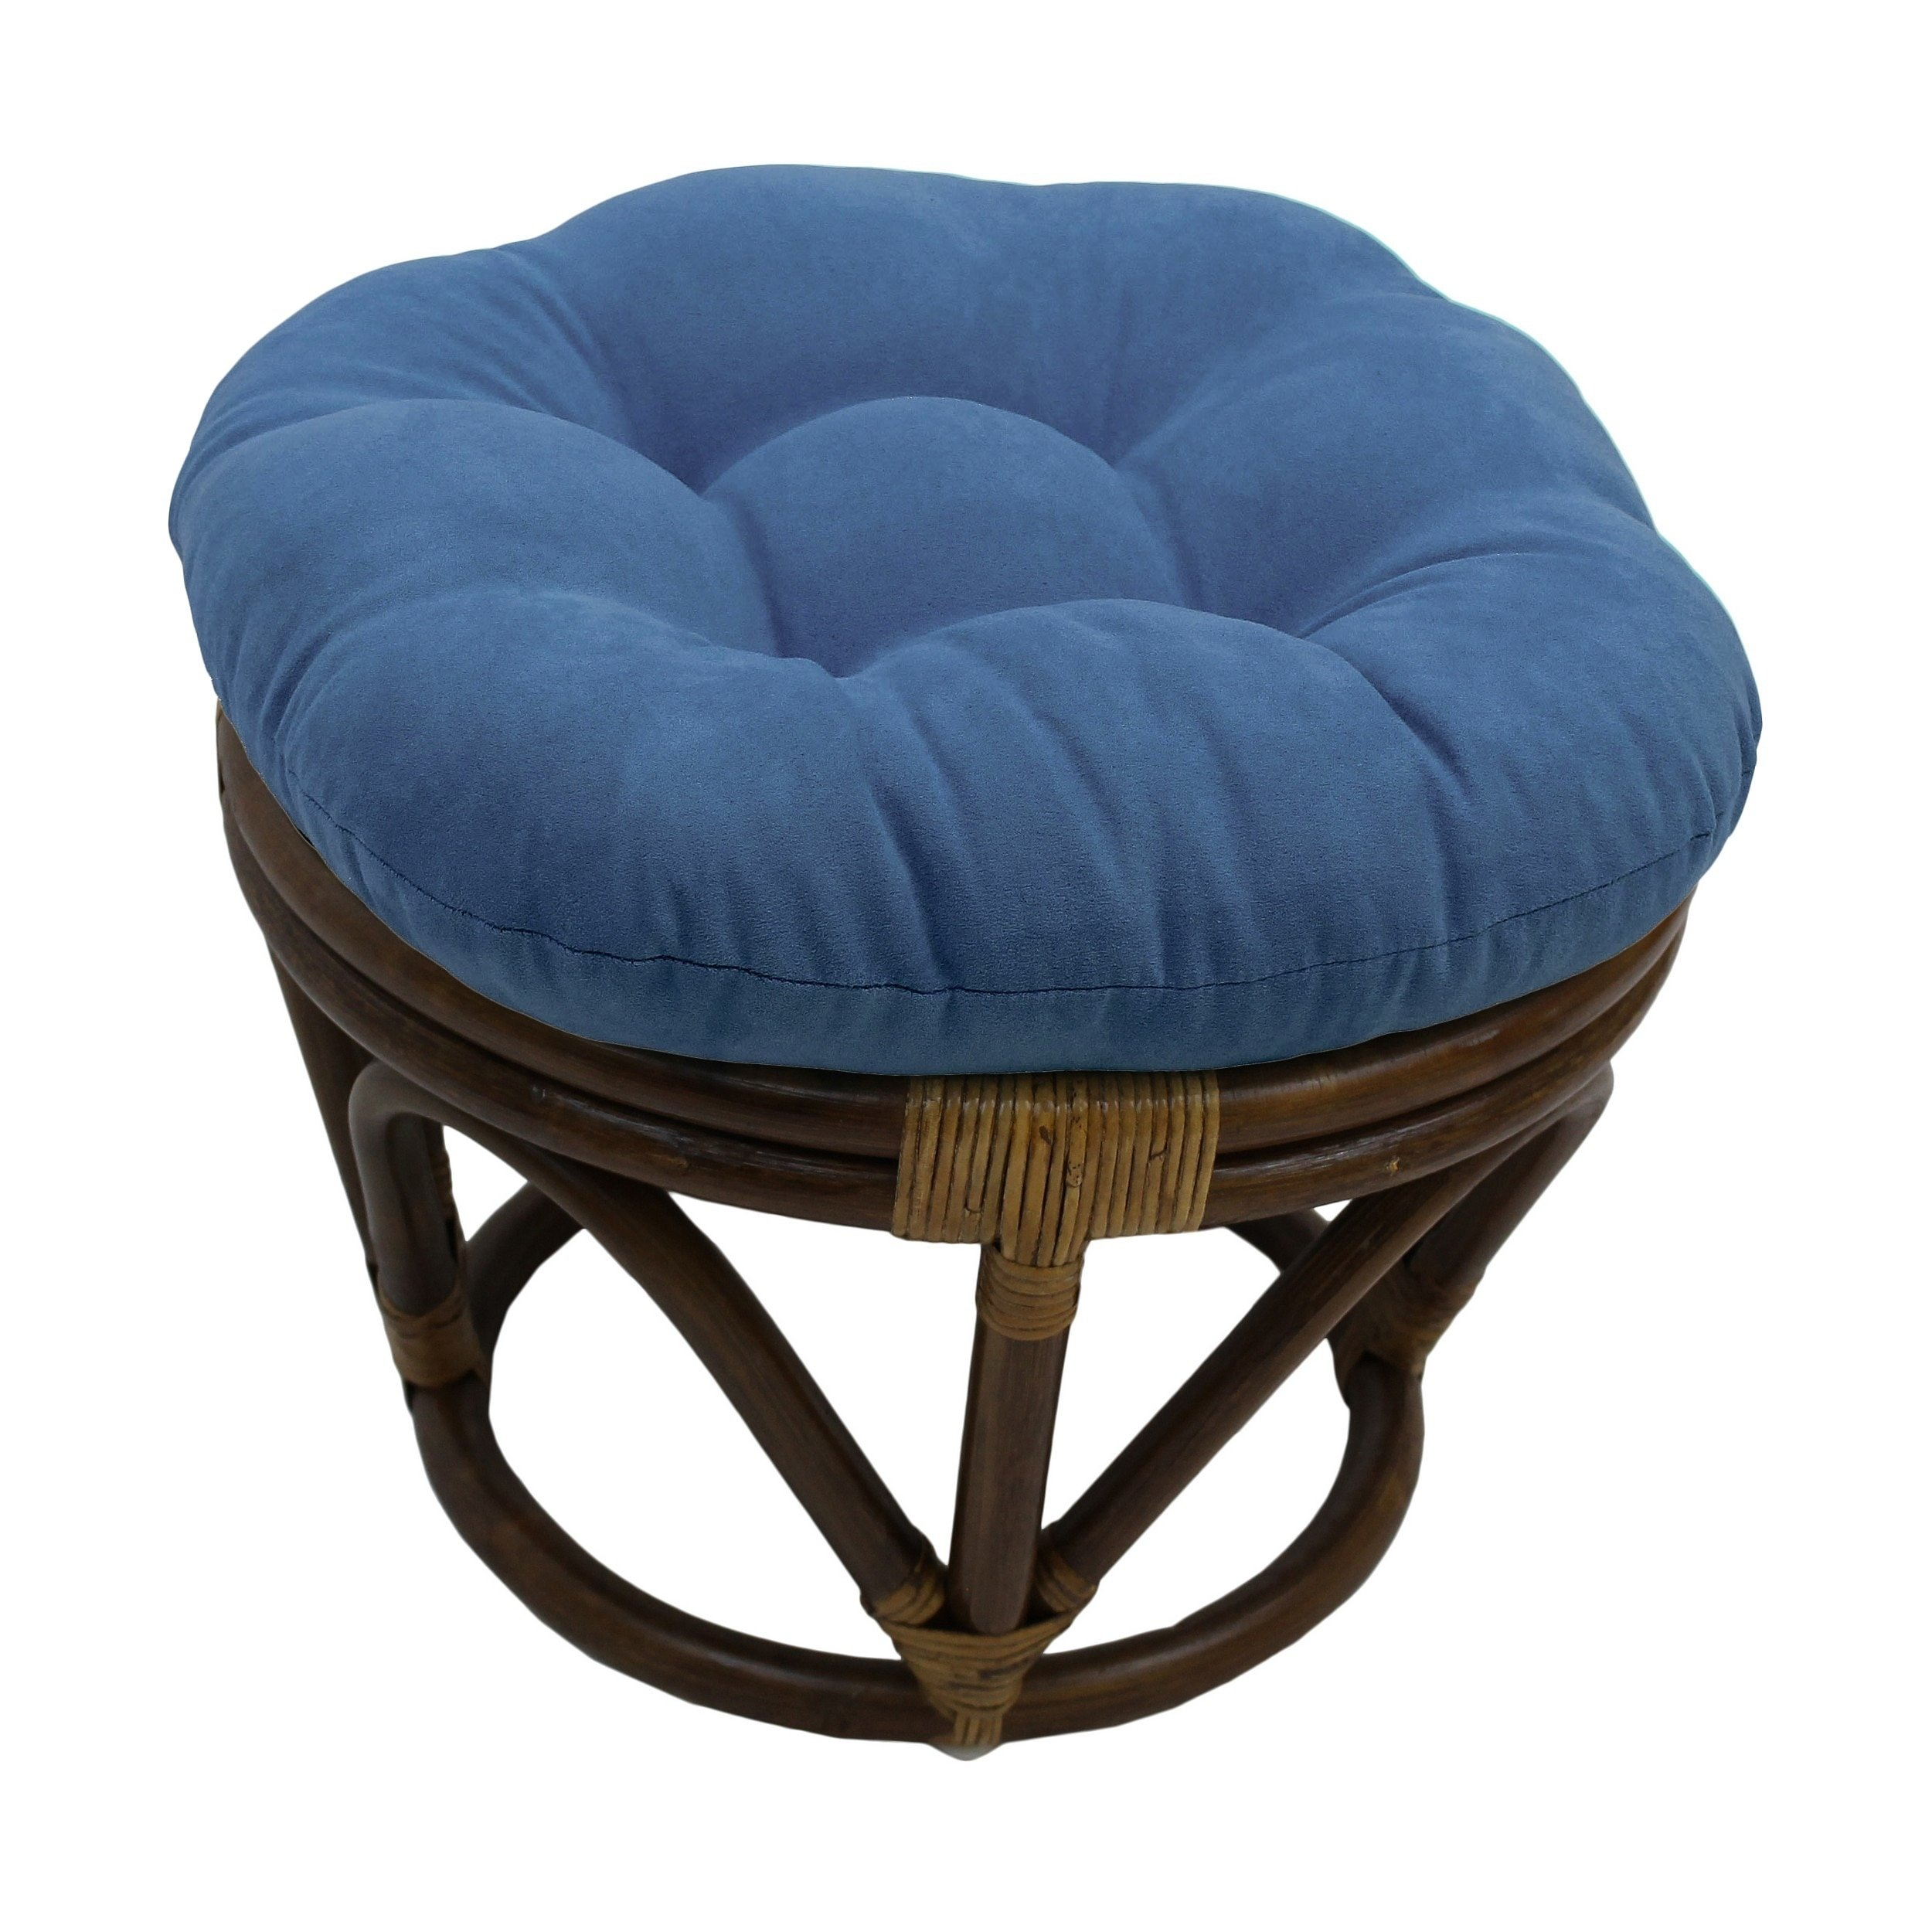 International Caravan Bali Papasan Footstool with Microsuede Cushion Indigo